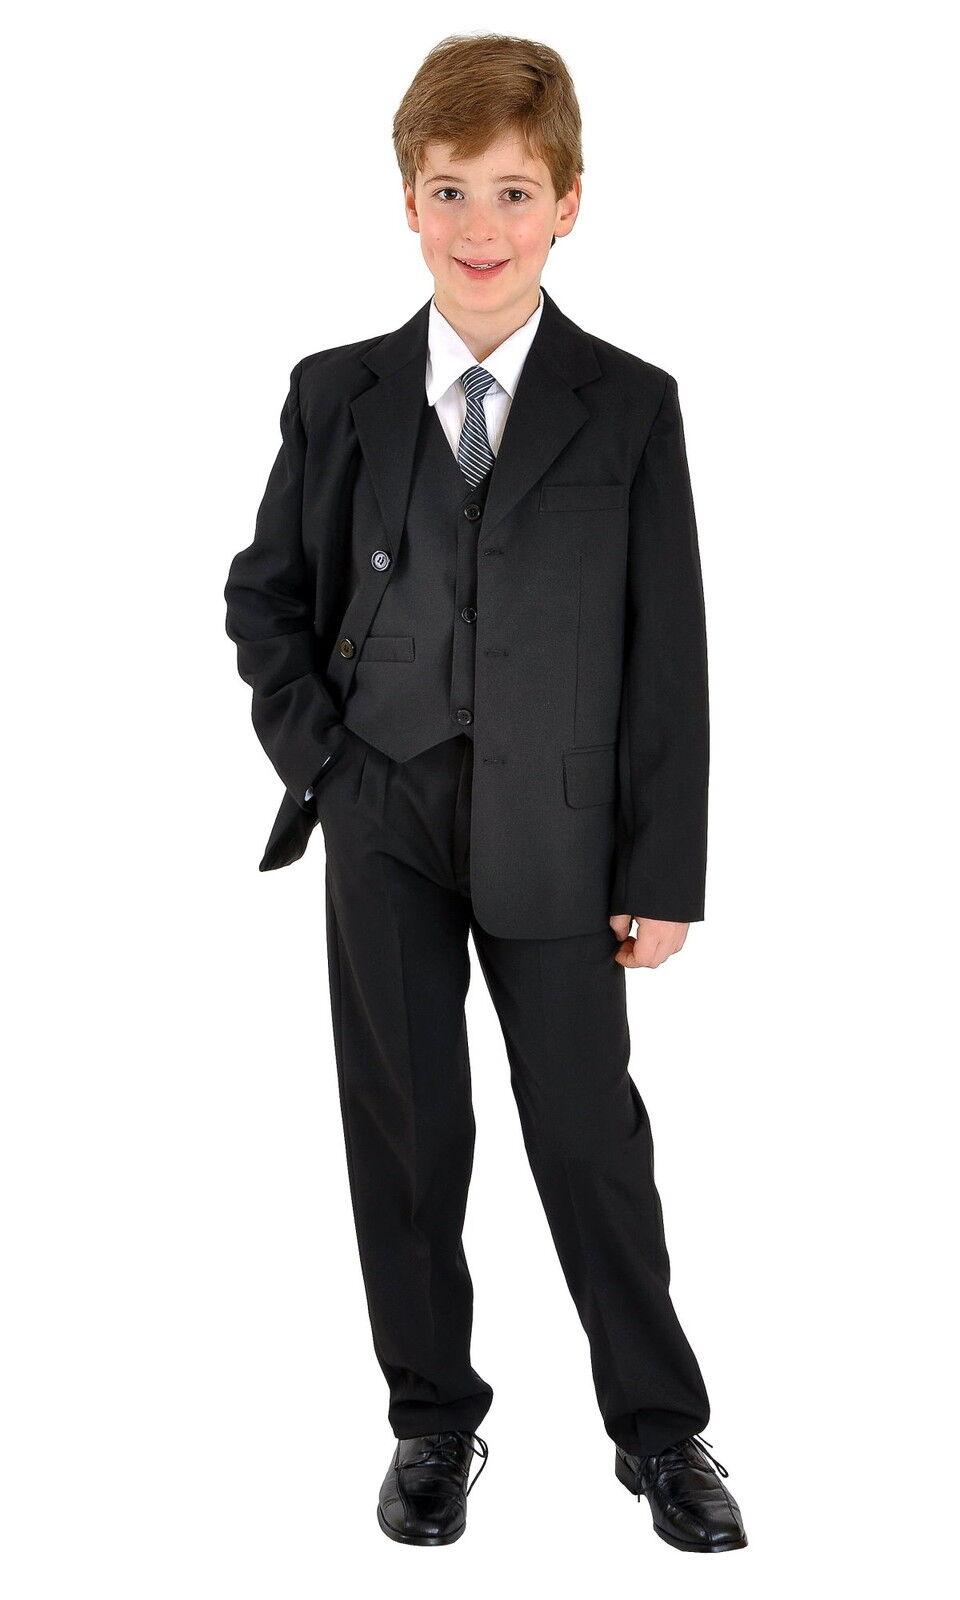 Jungenanzug Kinderanzug Kommunionsanzug Anzug Taufanzug uni schwarz 5 teilig